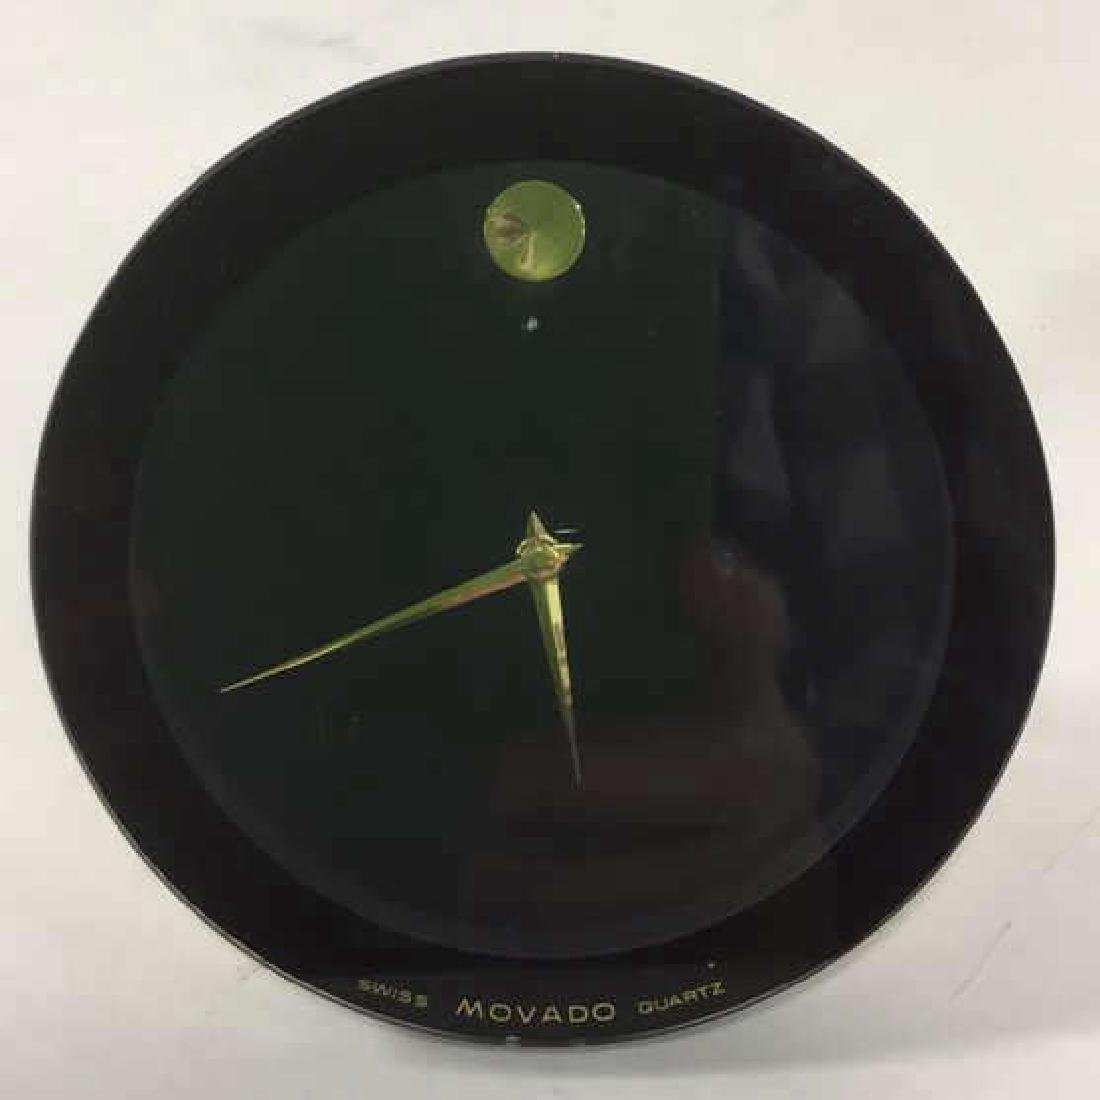 Vintage Movado Swiss Quartz Desk Clock